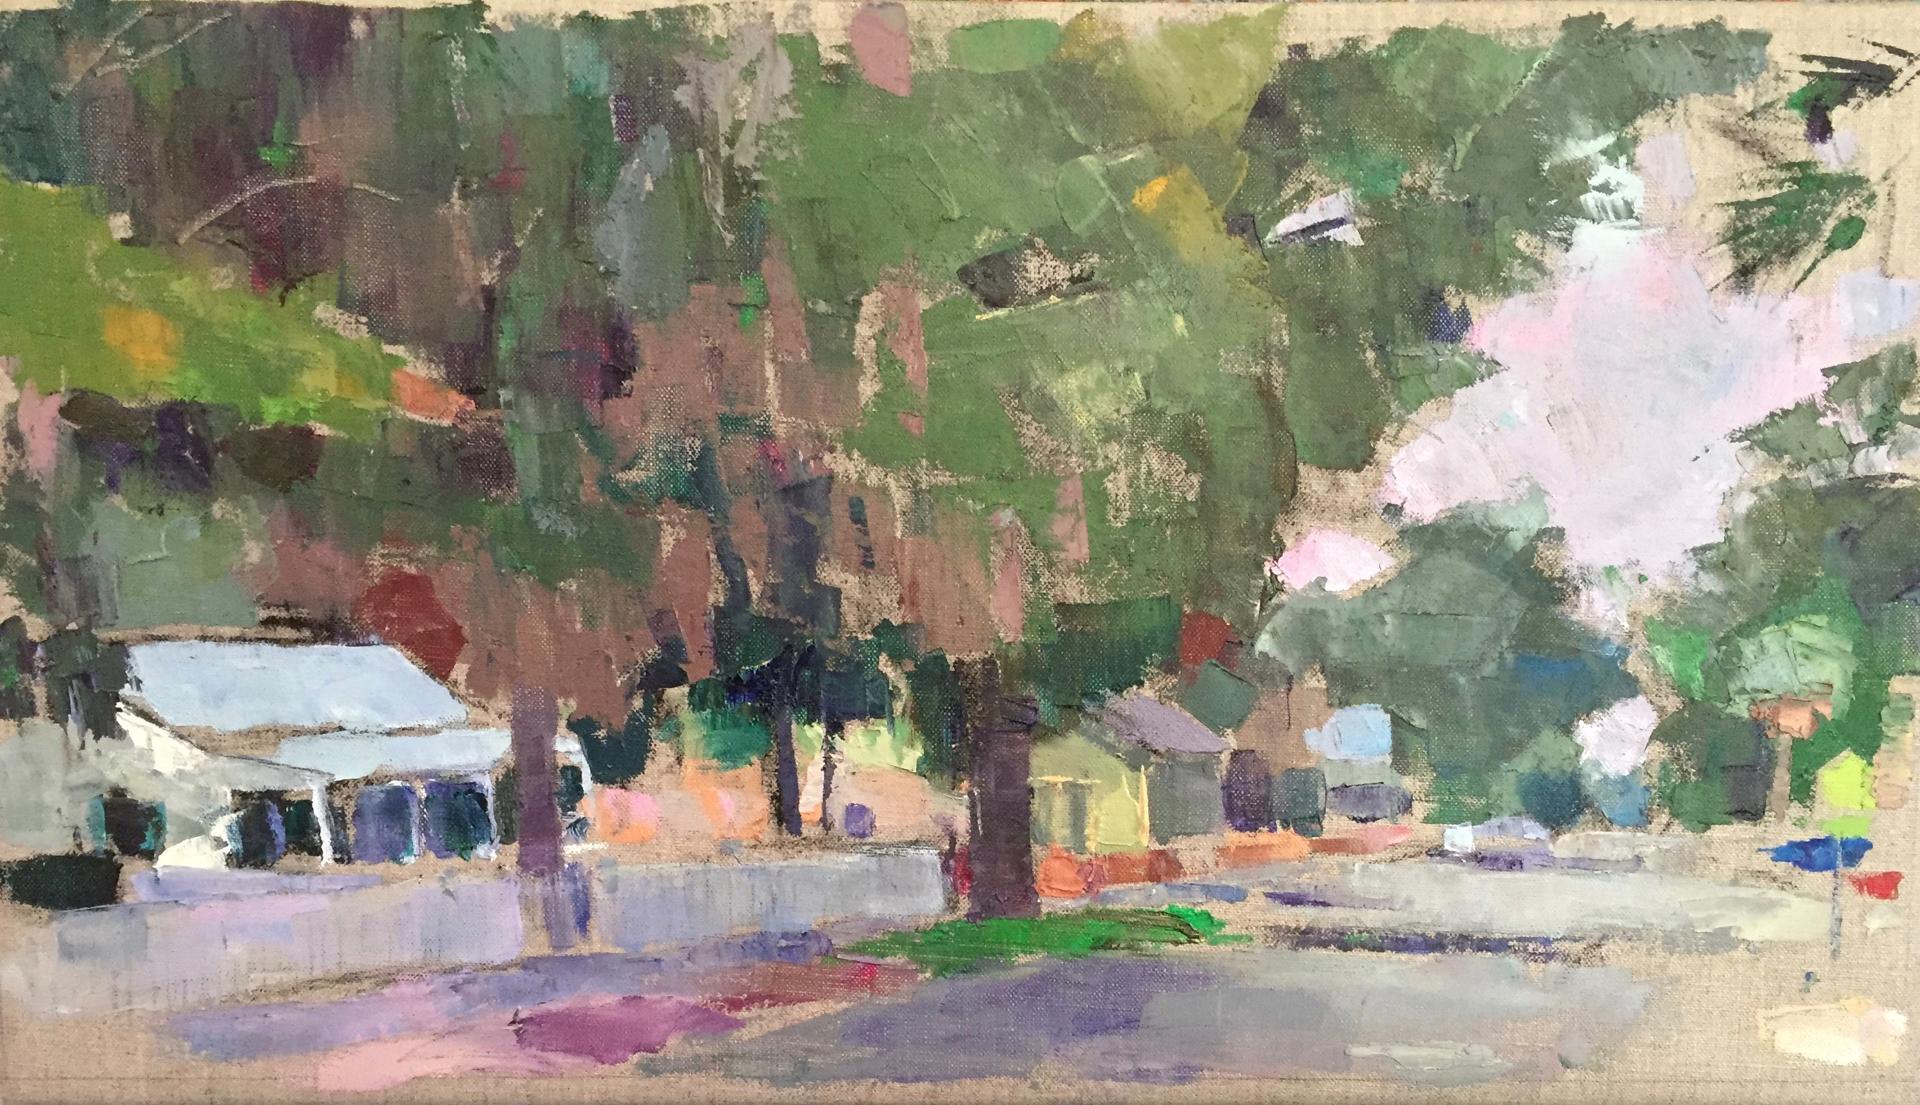 Bluffton by Larry Horowitz